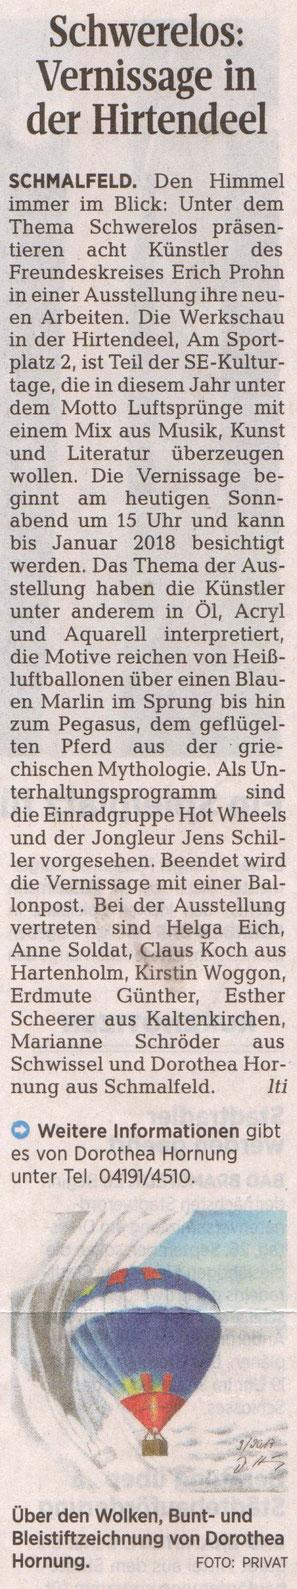 Segeberger Zeitung 16.09.2017